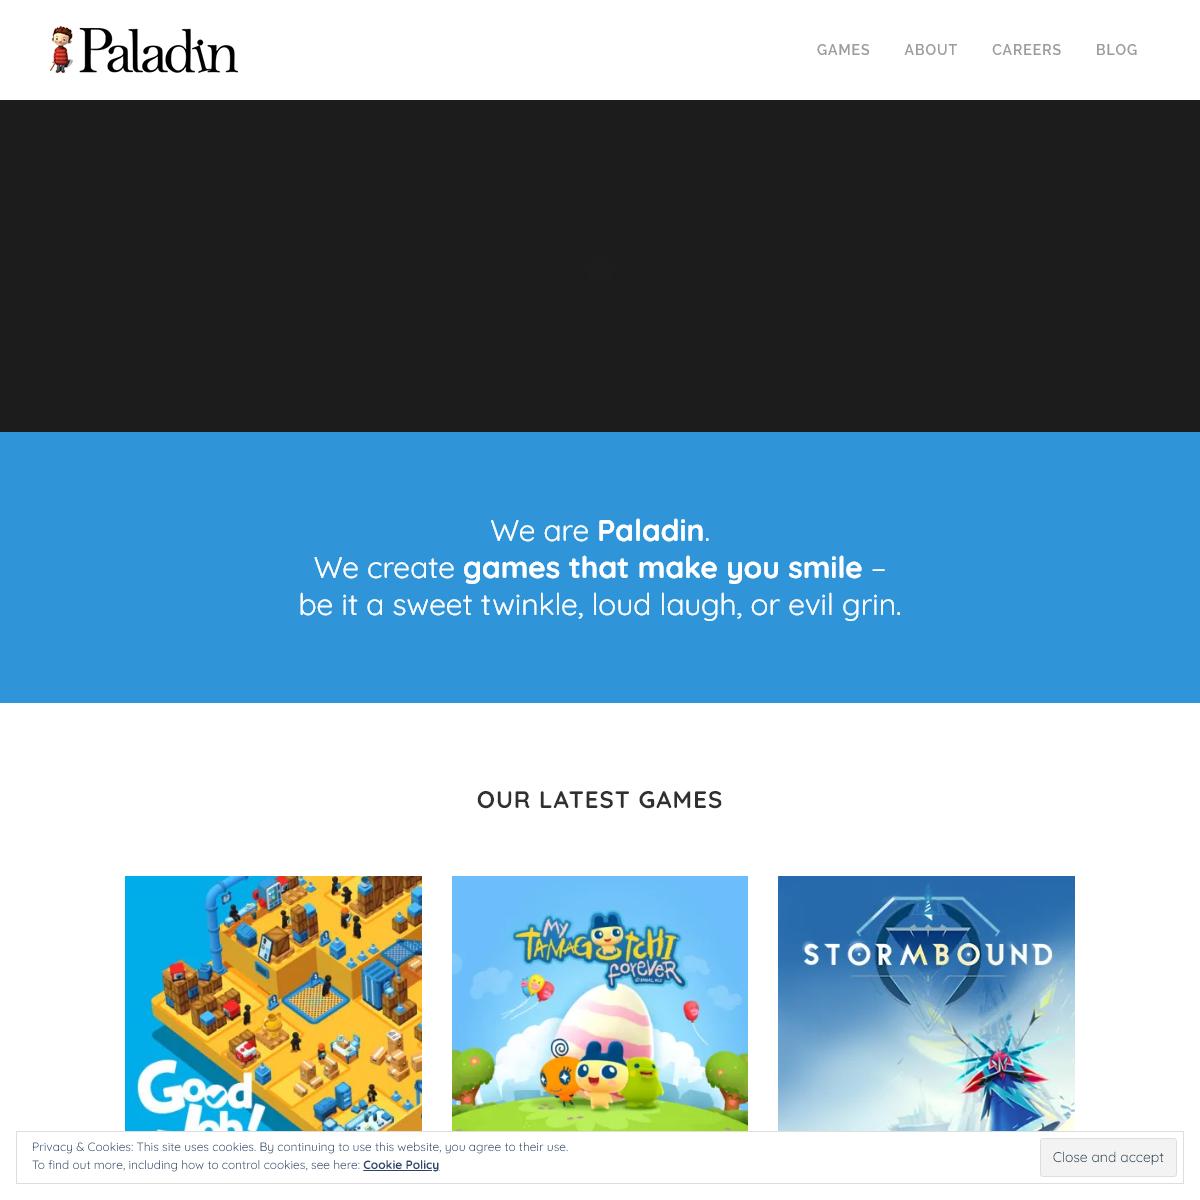 Paladin Studios - games that make you smile